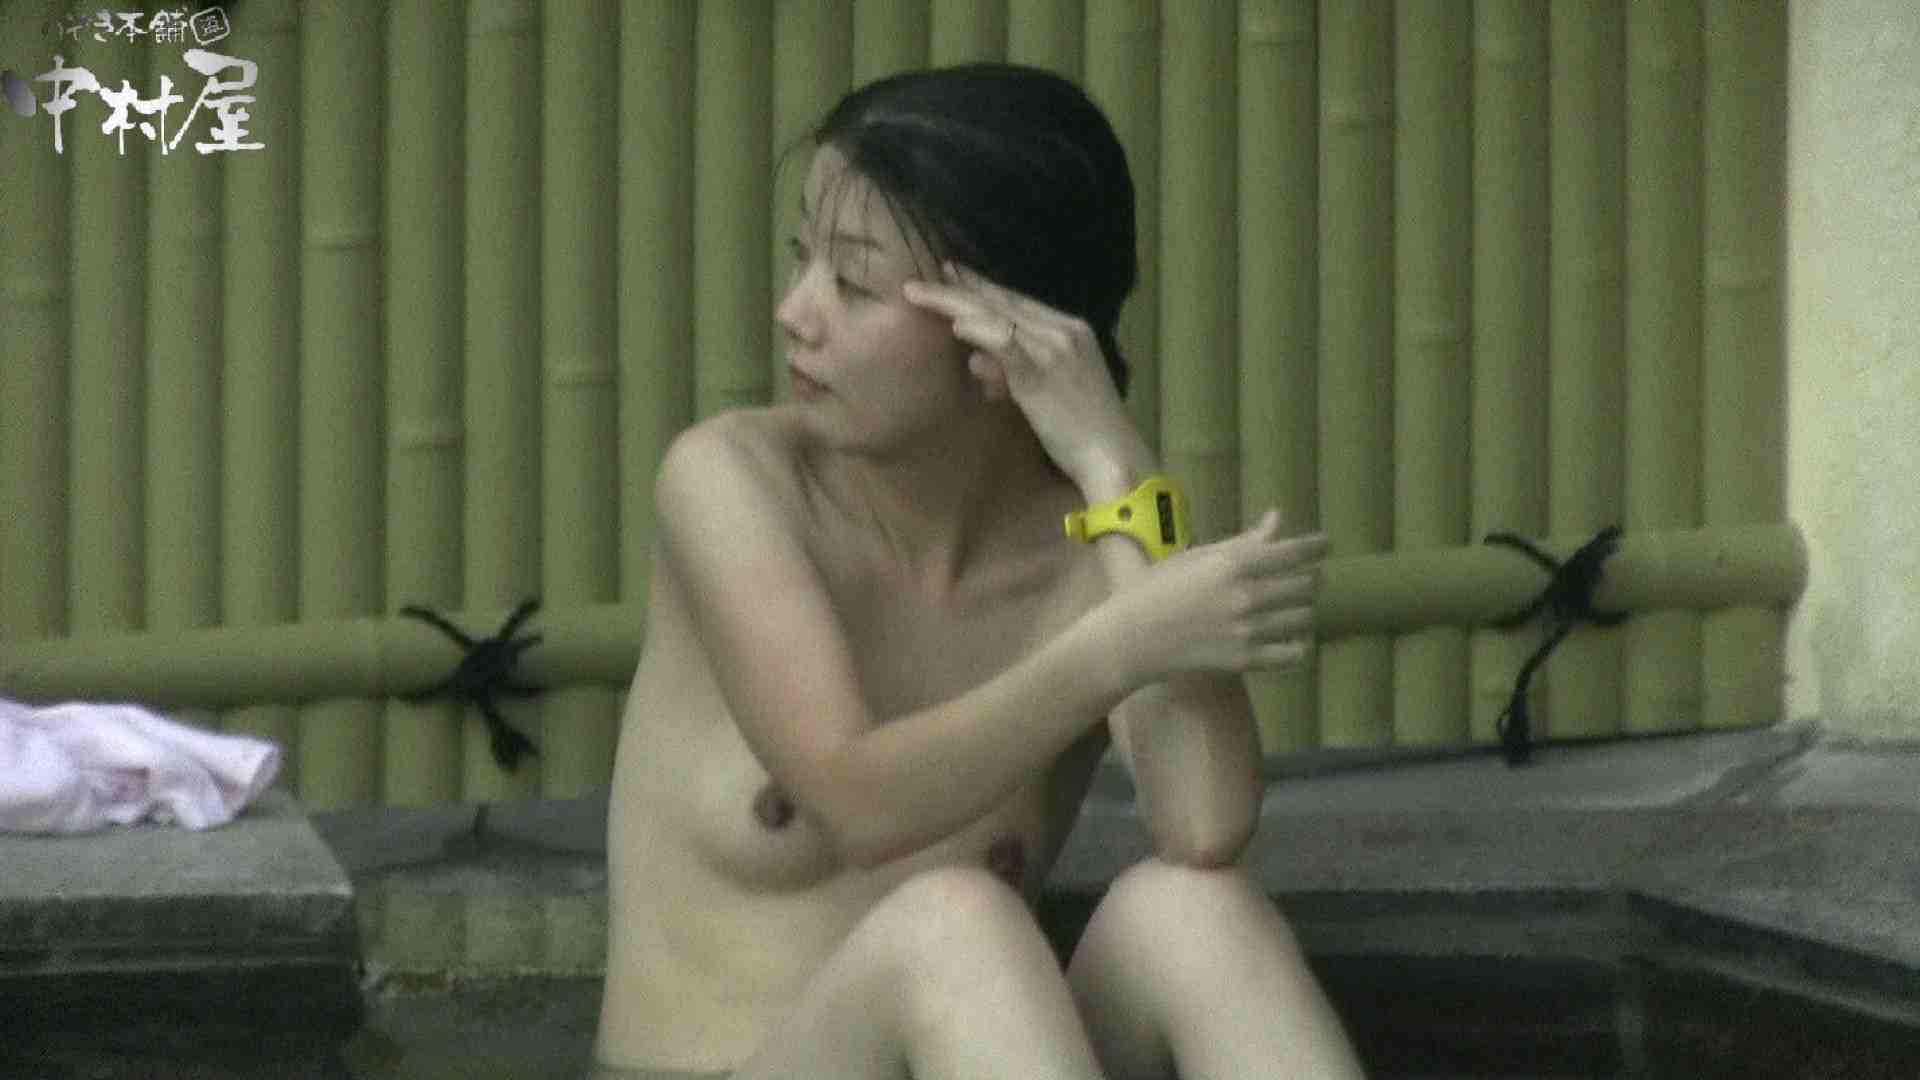 Aquaな露天風呂Vol.904 OL女体 アダルト動画キャプチャ 85連発 56